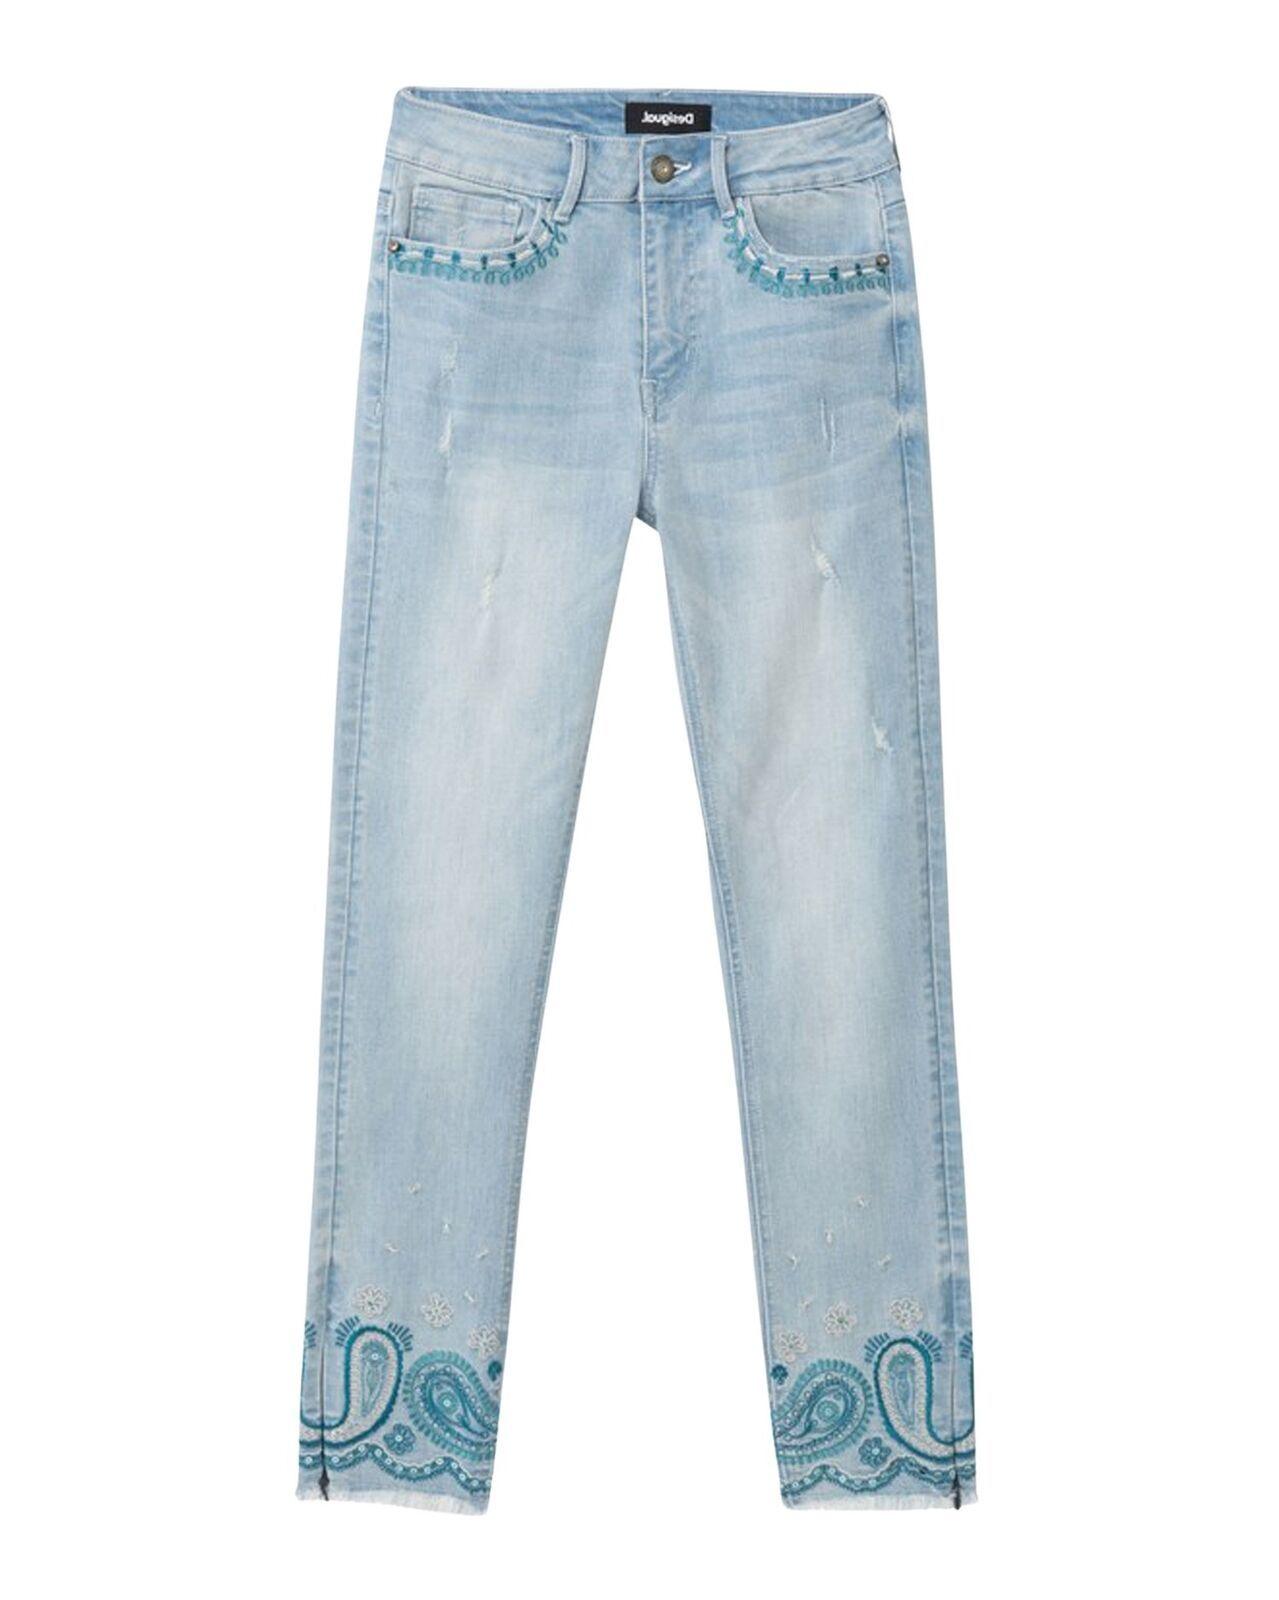 DESIGUAL | Jeans | 21SWDD355058